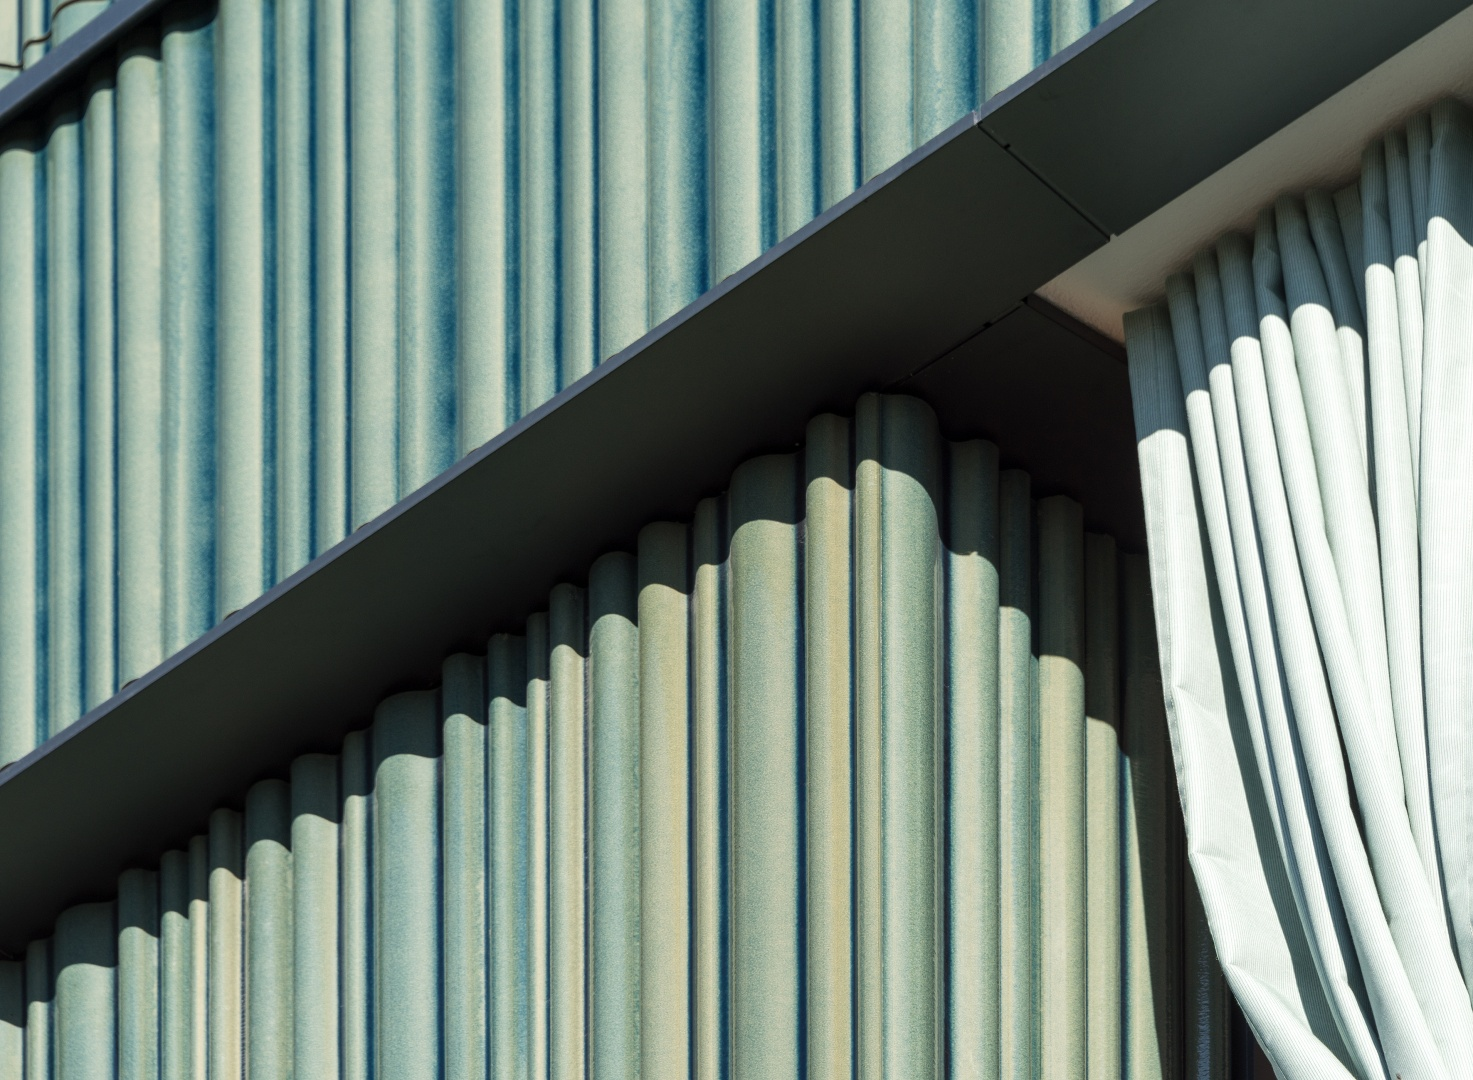 Keramikfassade © Johannes Marburg